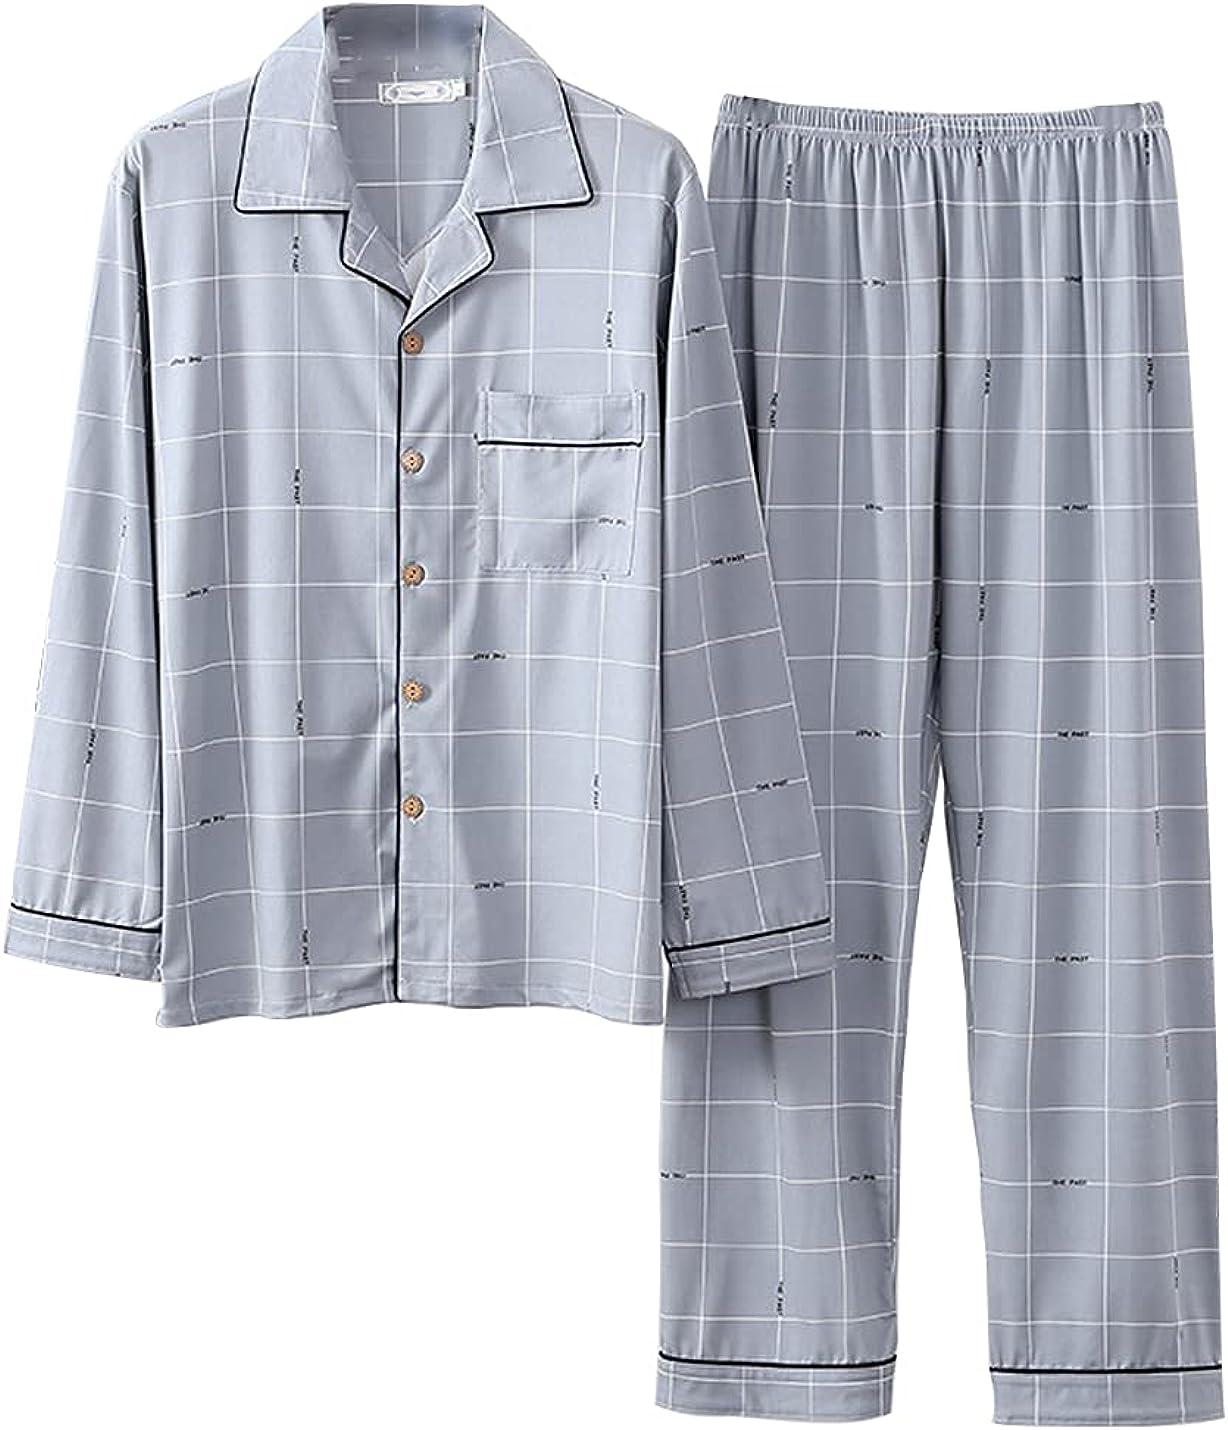 Men's Long Sleeve Broadcloth Sleep Set 2 Pieces Lightweight Casual Pajama Set